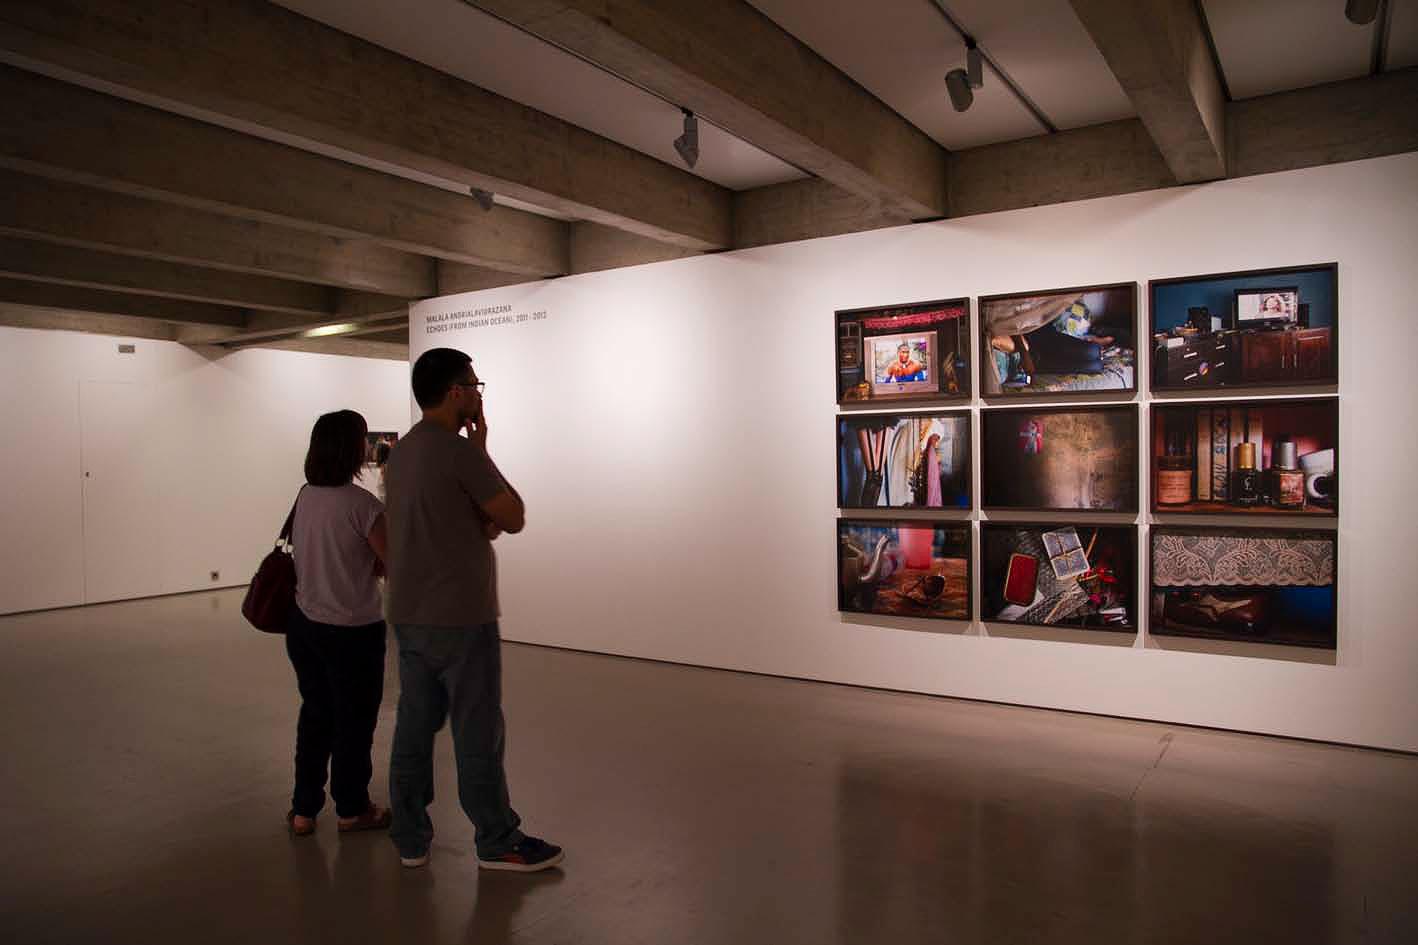 Present Tense Exhibition, Fundação Calouste Gulbenkian, Lisbon, June – August 2013.  Curated by António Pinto Ribeiro.